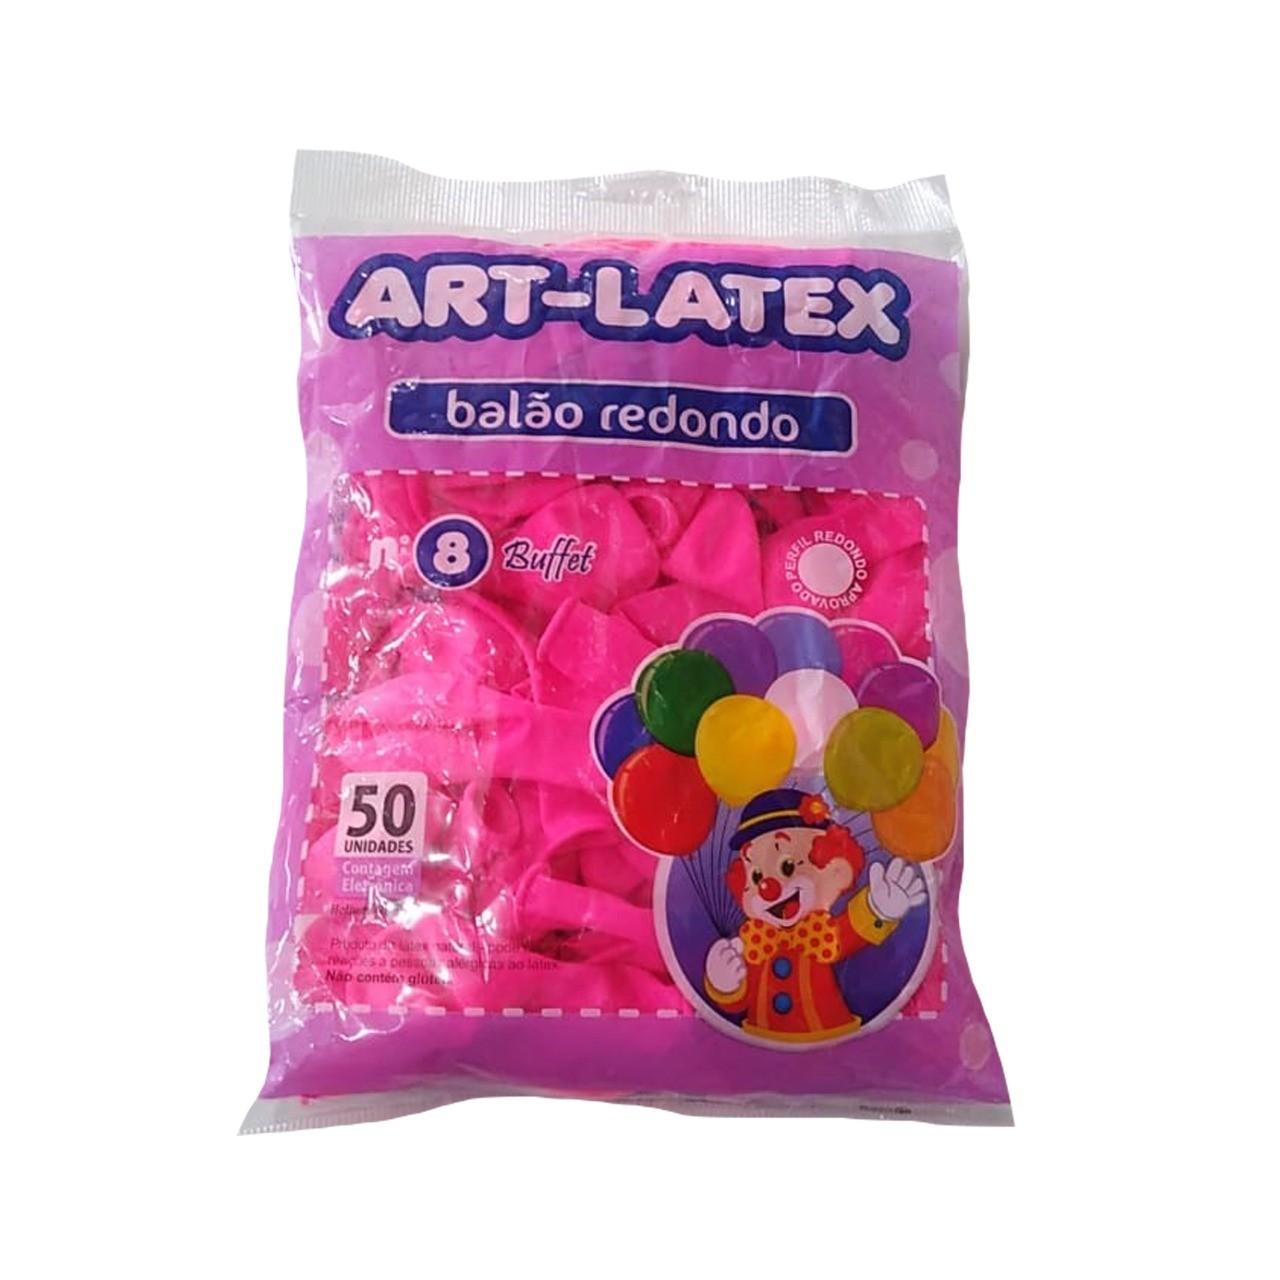 BALÃO LATEX REDONDO BUFFET ROSA PINK - N°8